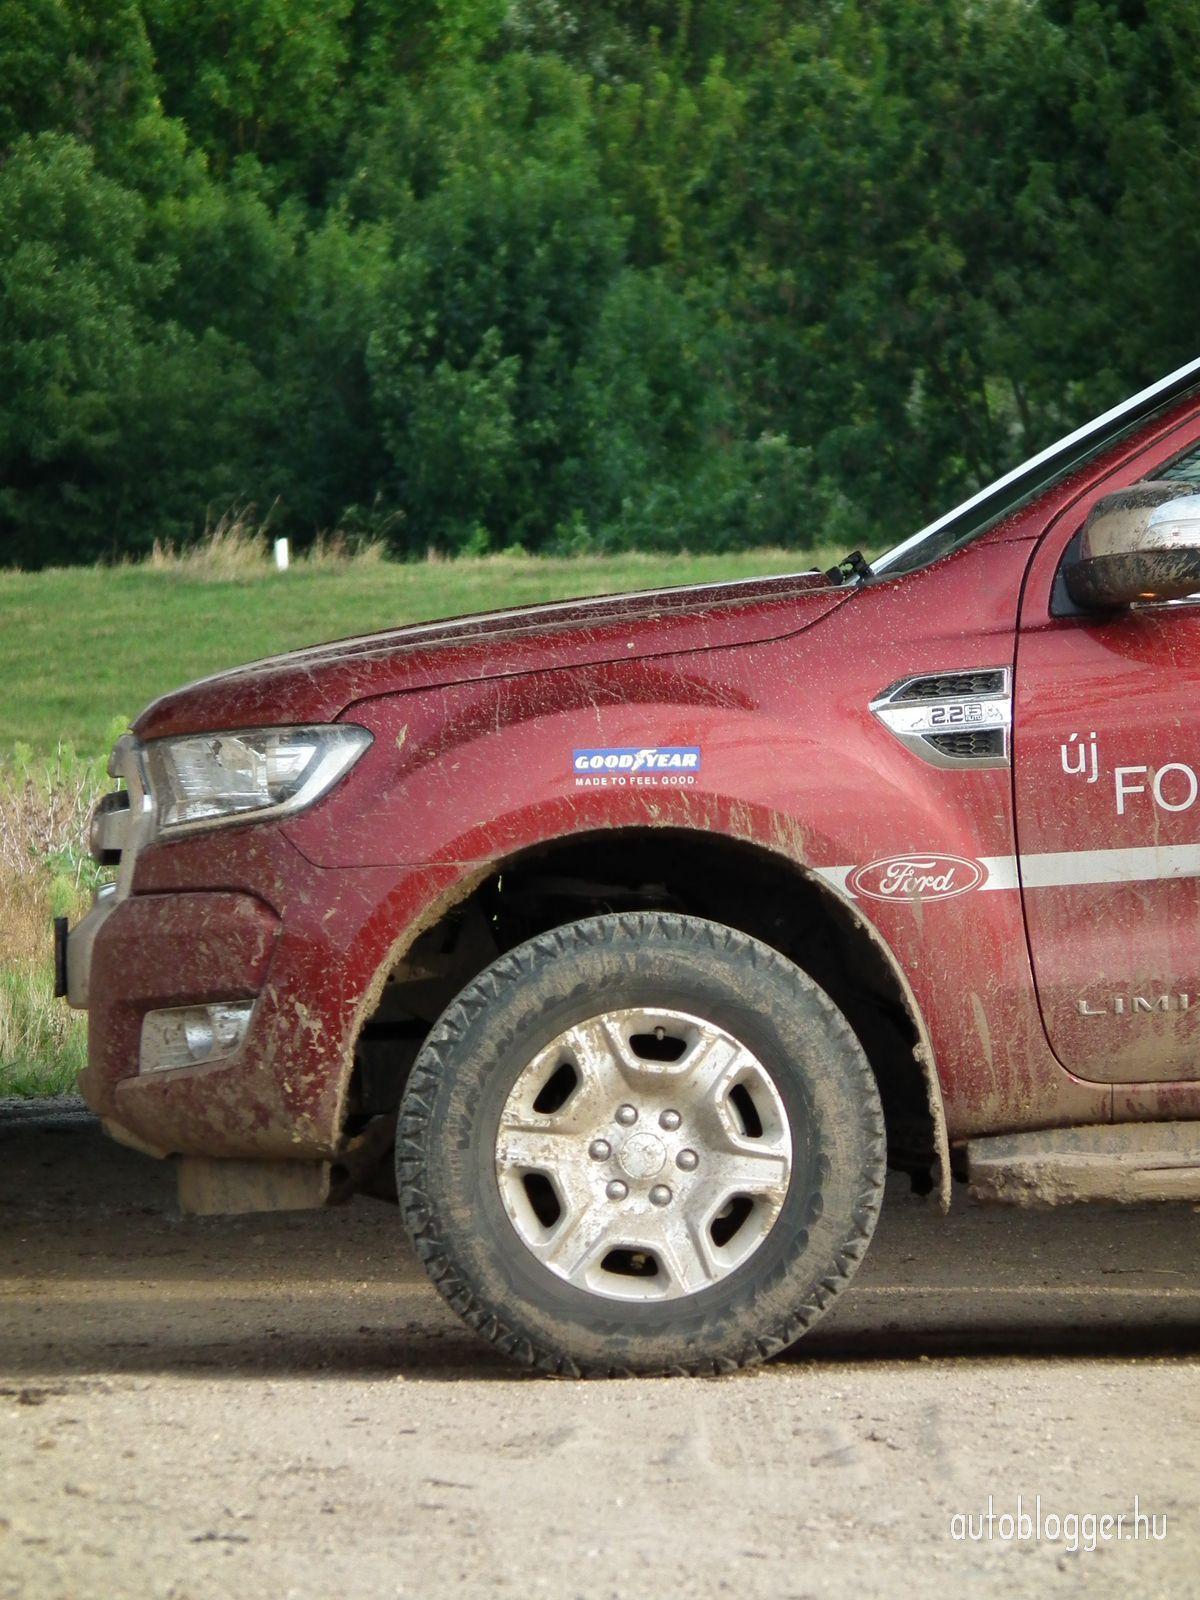 Ford_Ranger_teszt_autoblogger.hu_00554